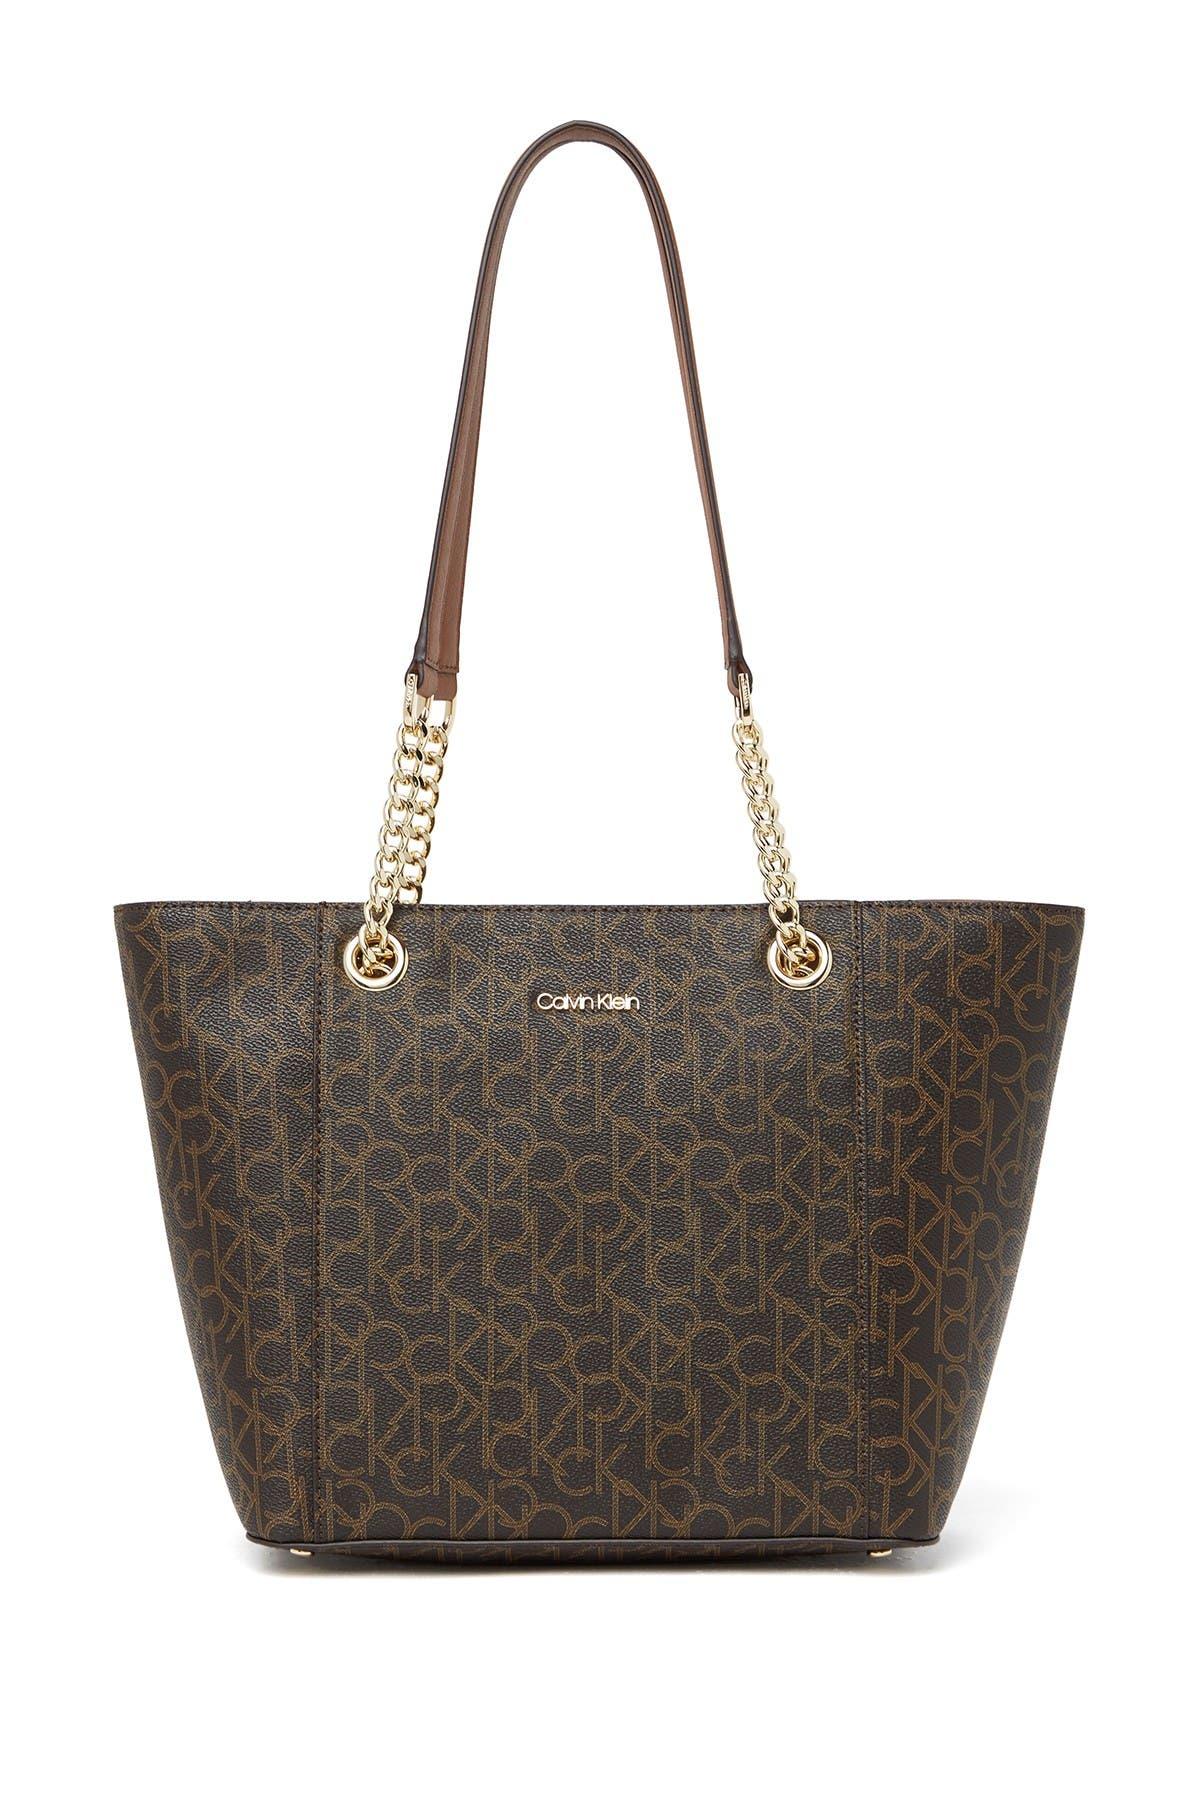 Image of Calvin Klein Hayden Key Item Monogram Tote Bag